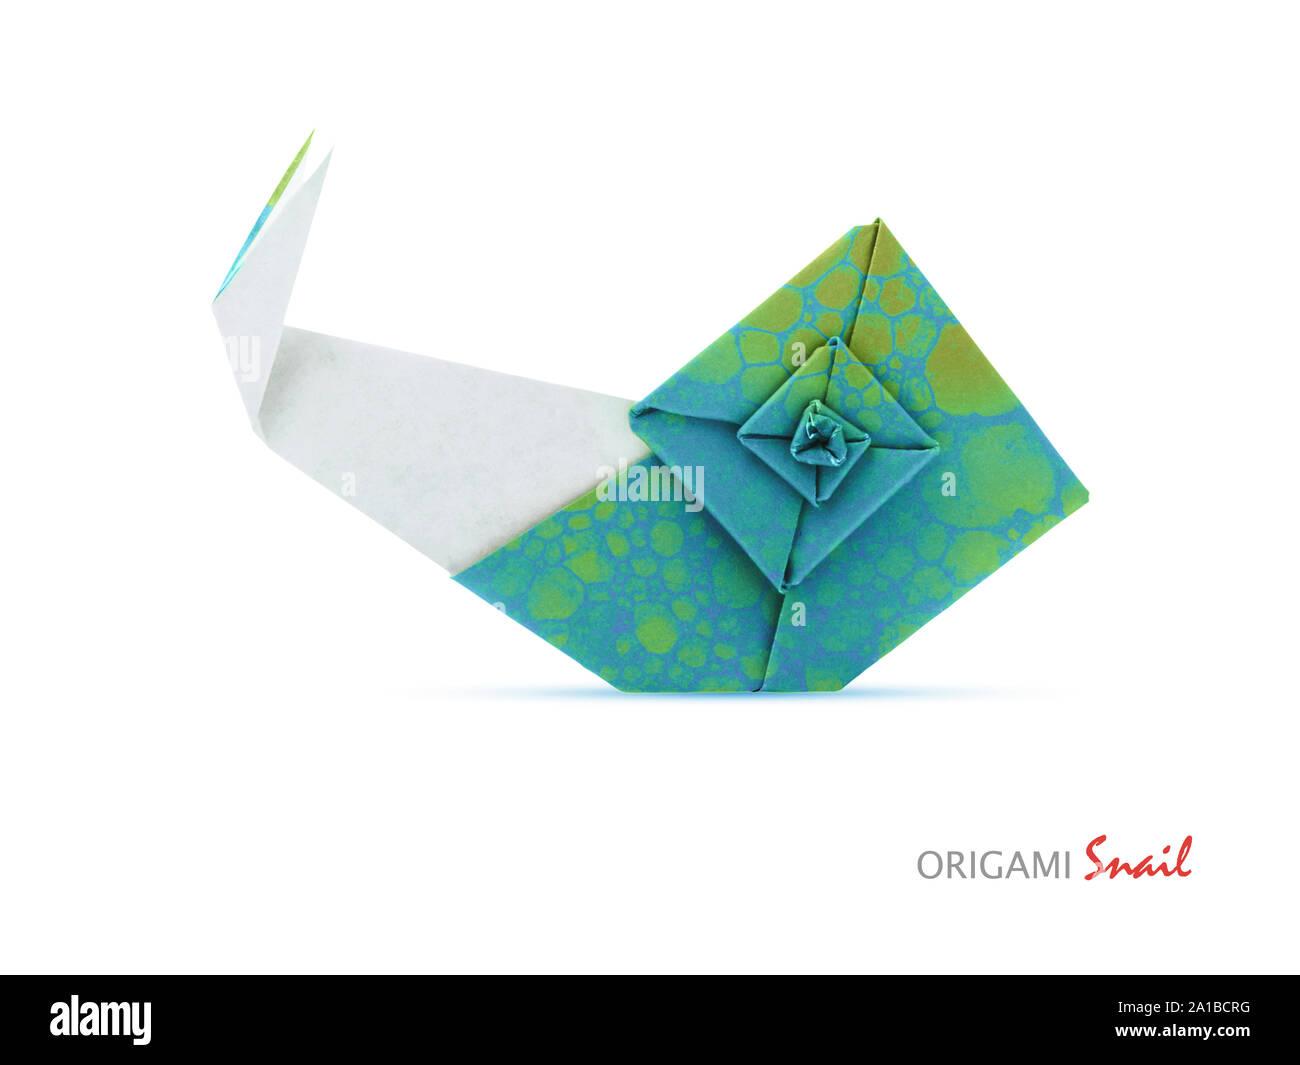 Origami Snail Tutorial - Designed by Eric Gjerde - Paper Kawaii ... | 1065x1300